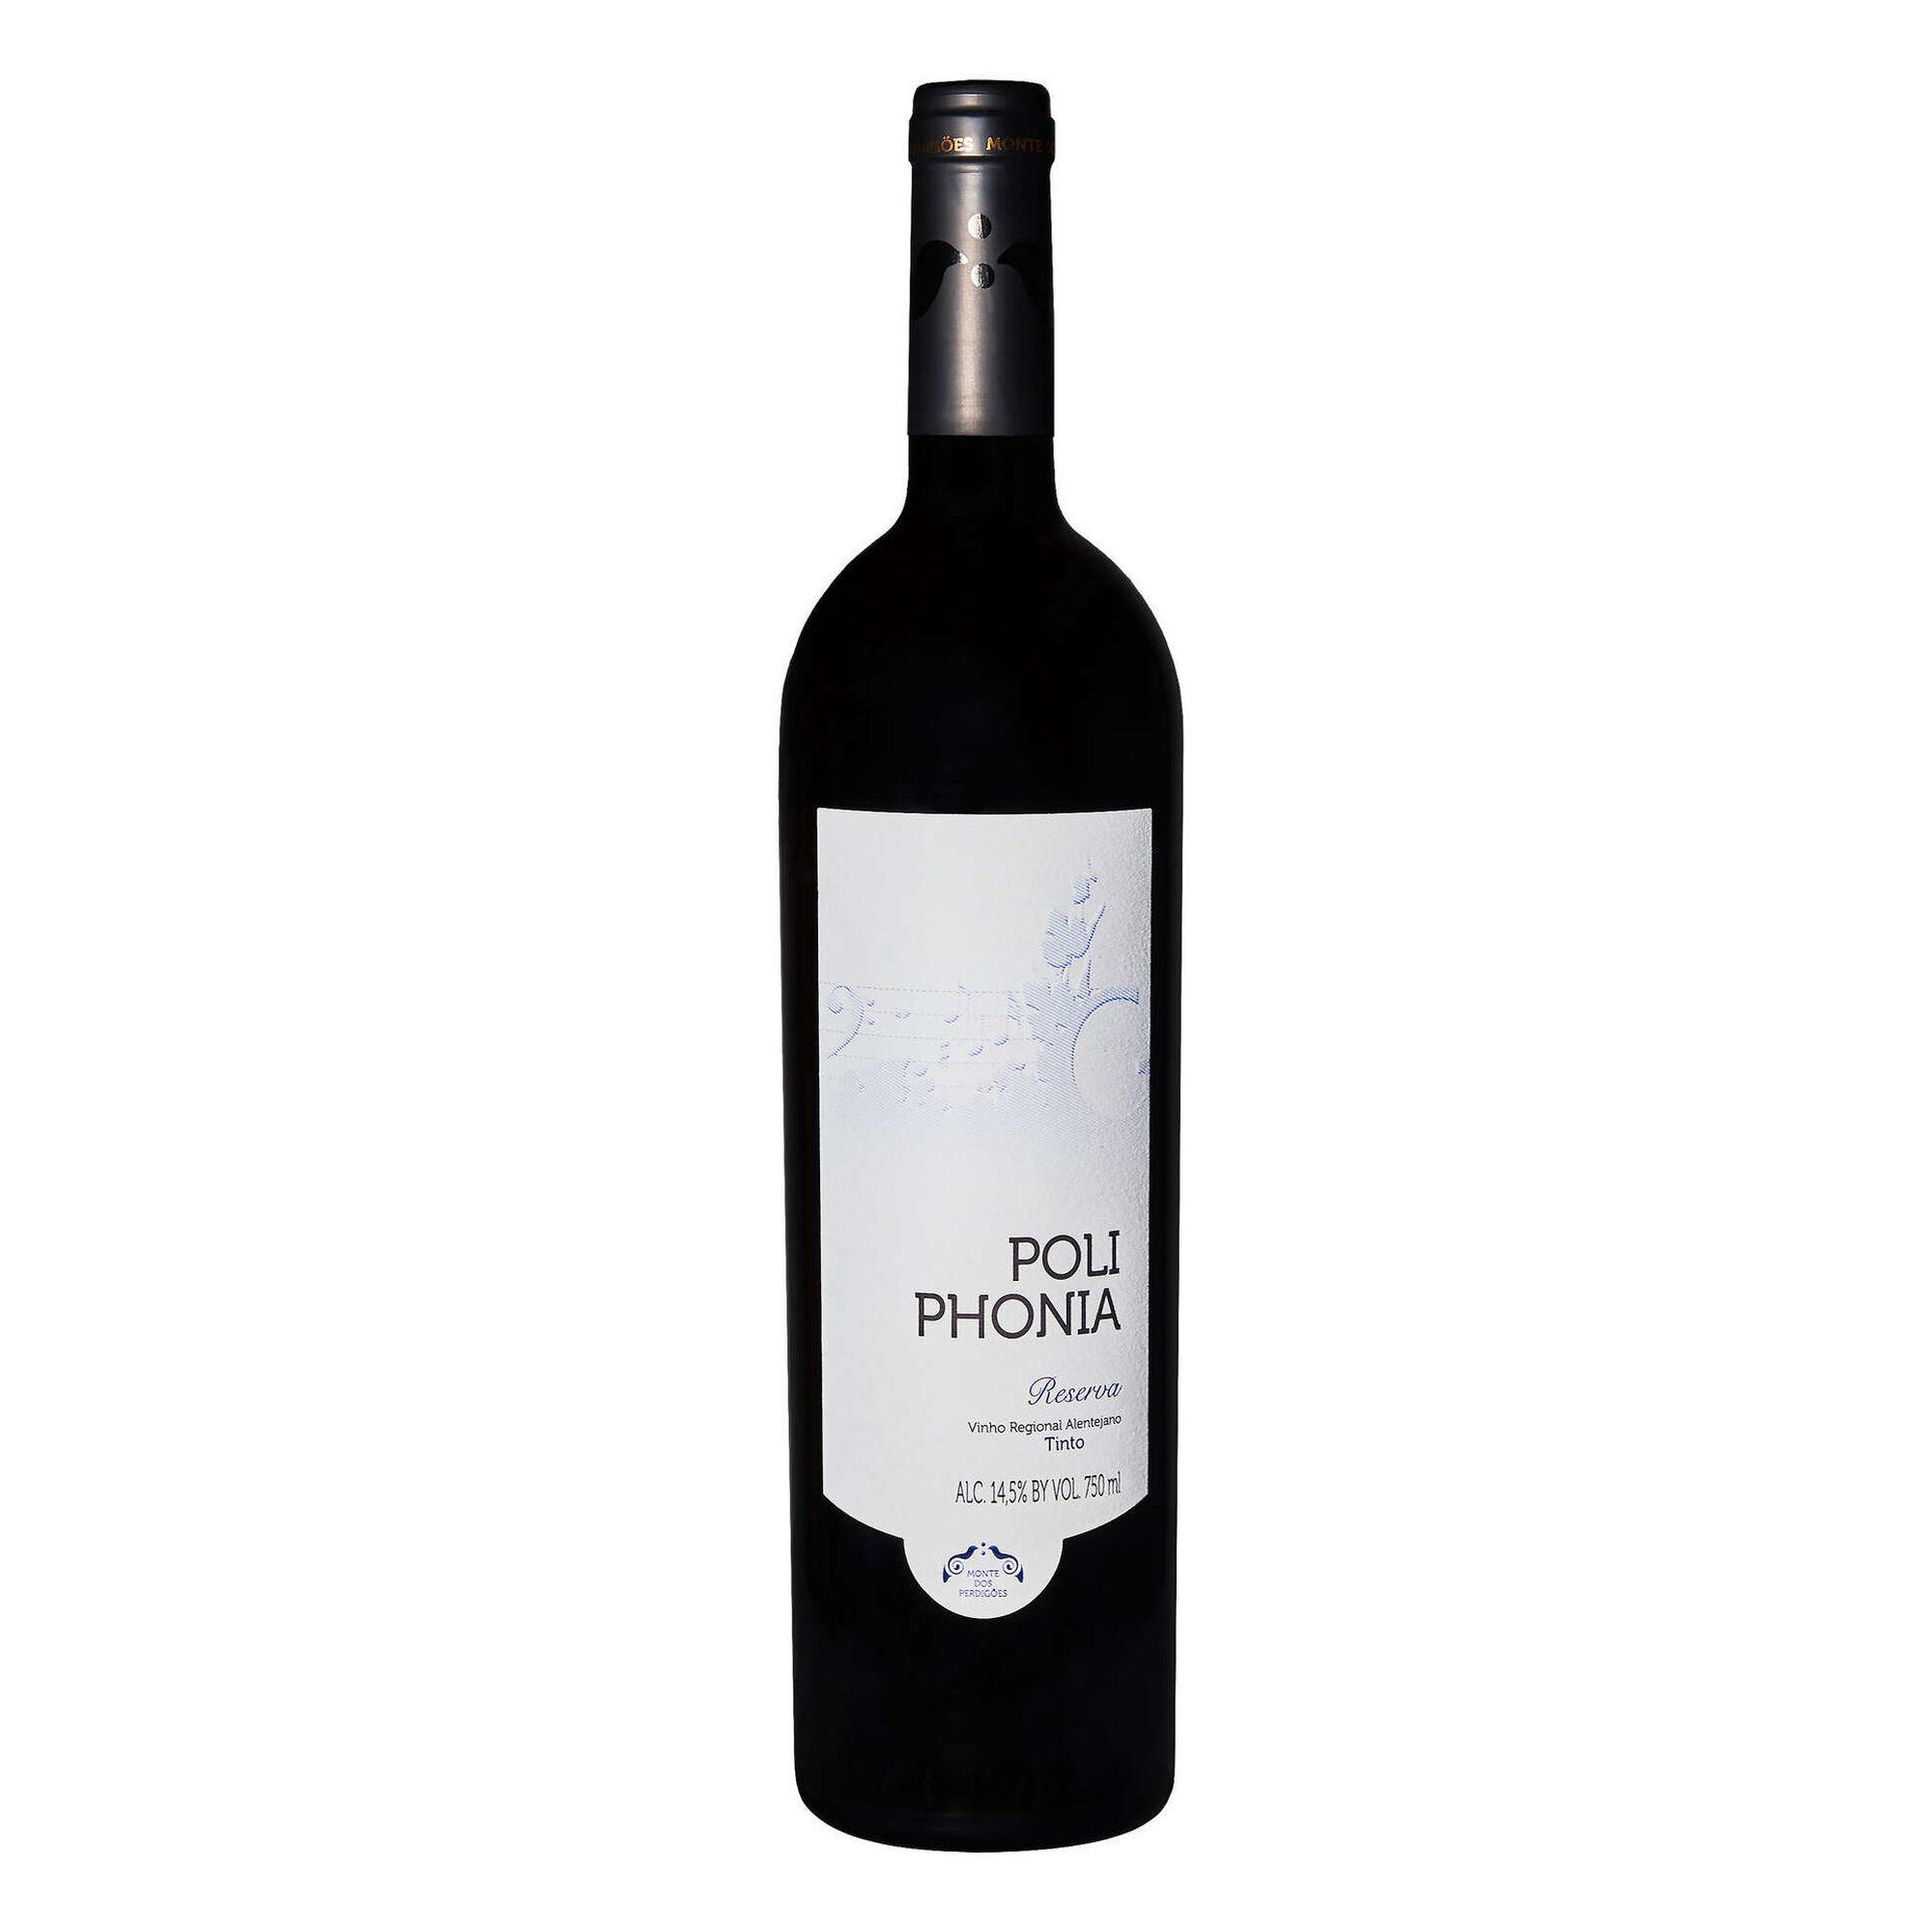 Poliphonia Reserva Regional Alentejano Vinho Tinto